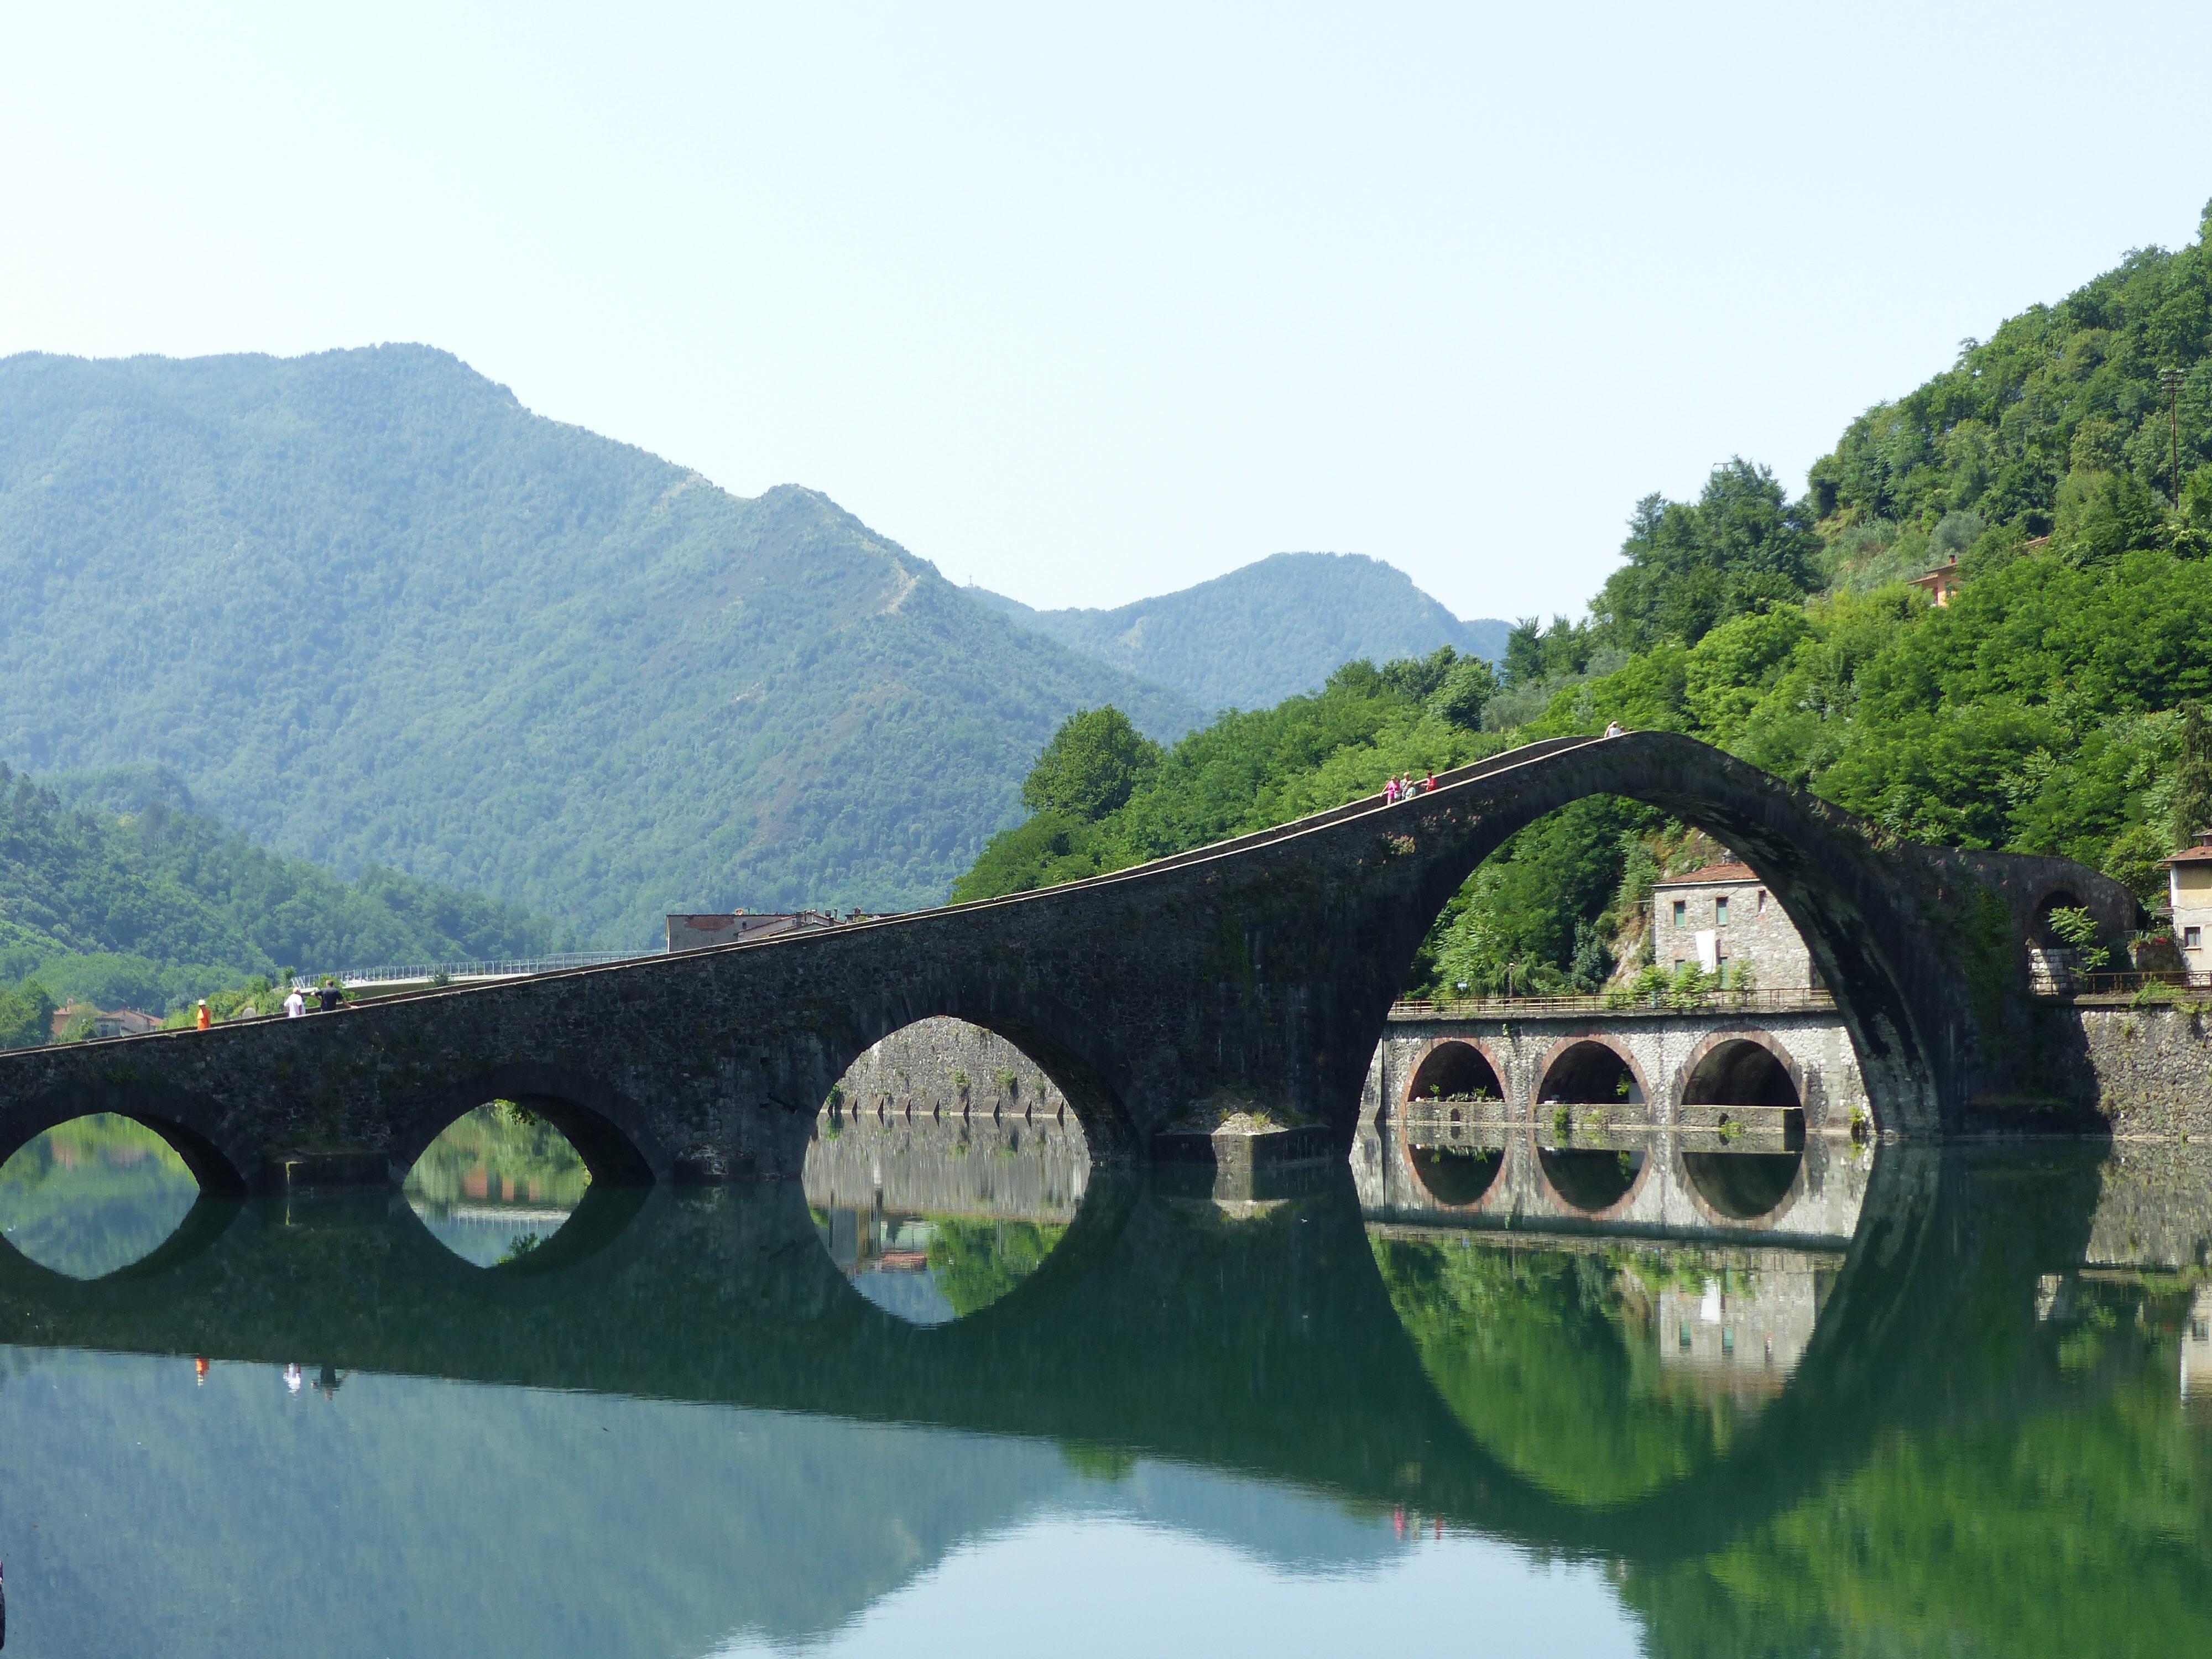 Bridge reflections | Bella Bagni di Lucca